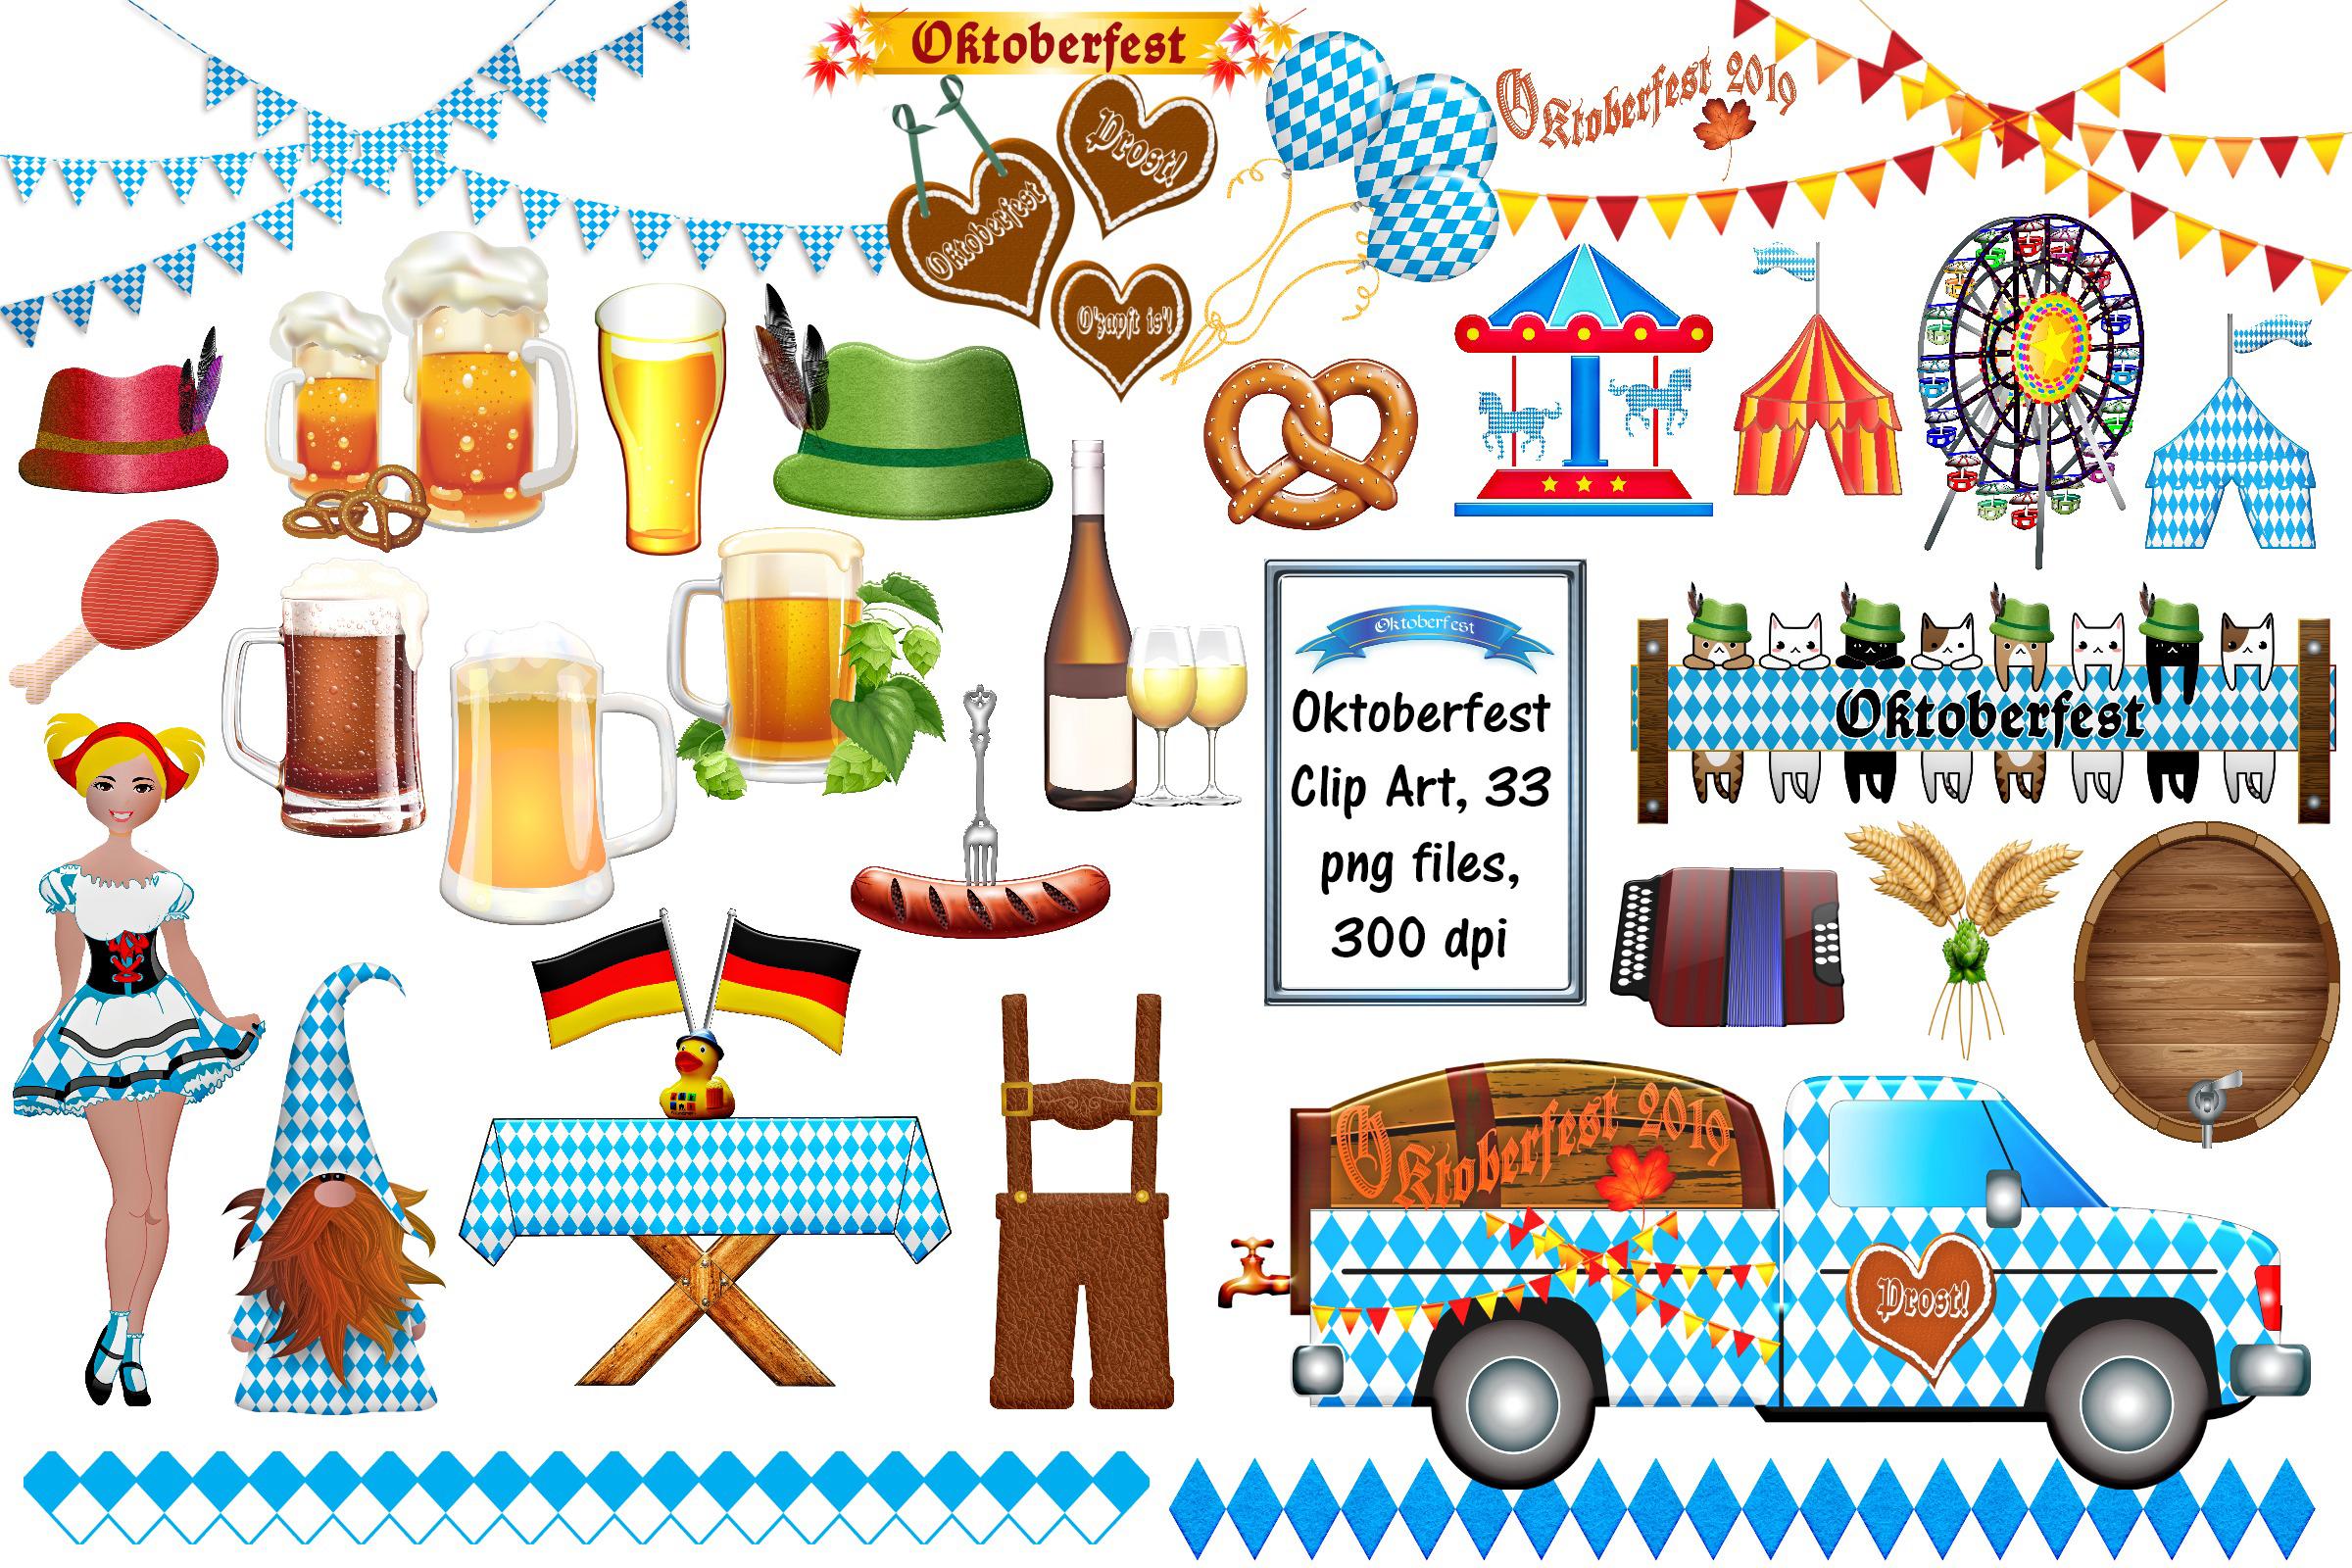 Oktoberfest clipart design, Oktoberfest design Transparent.